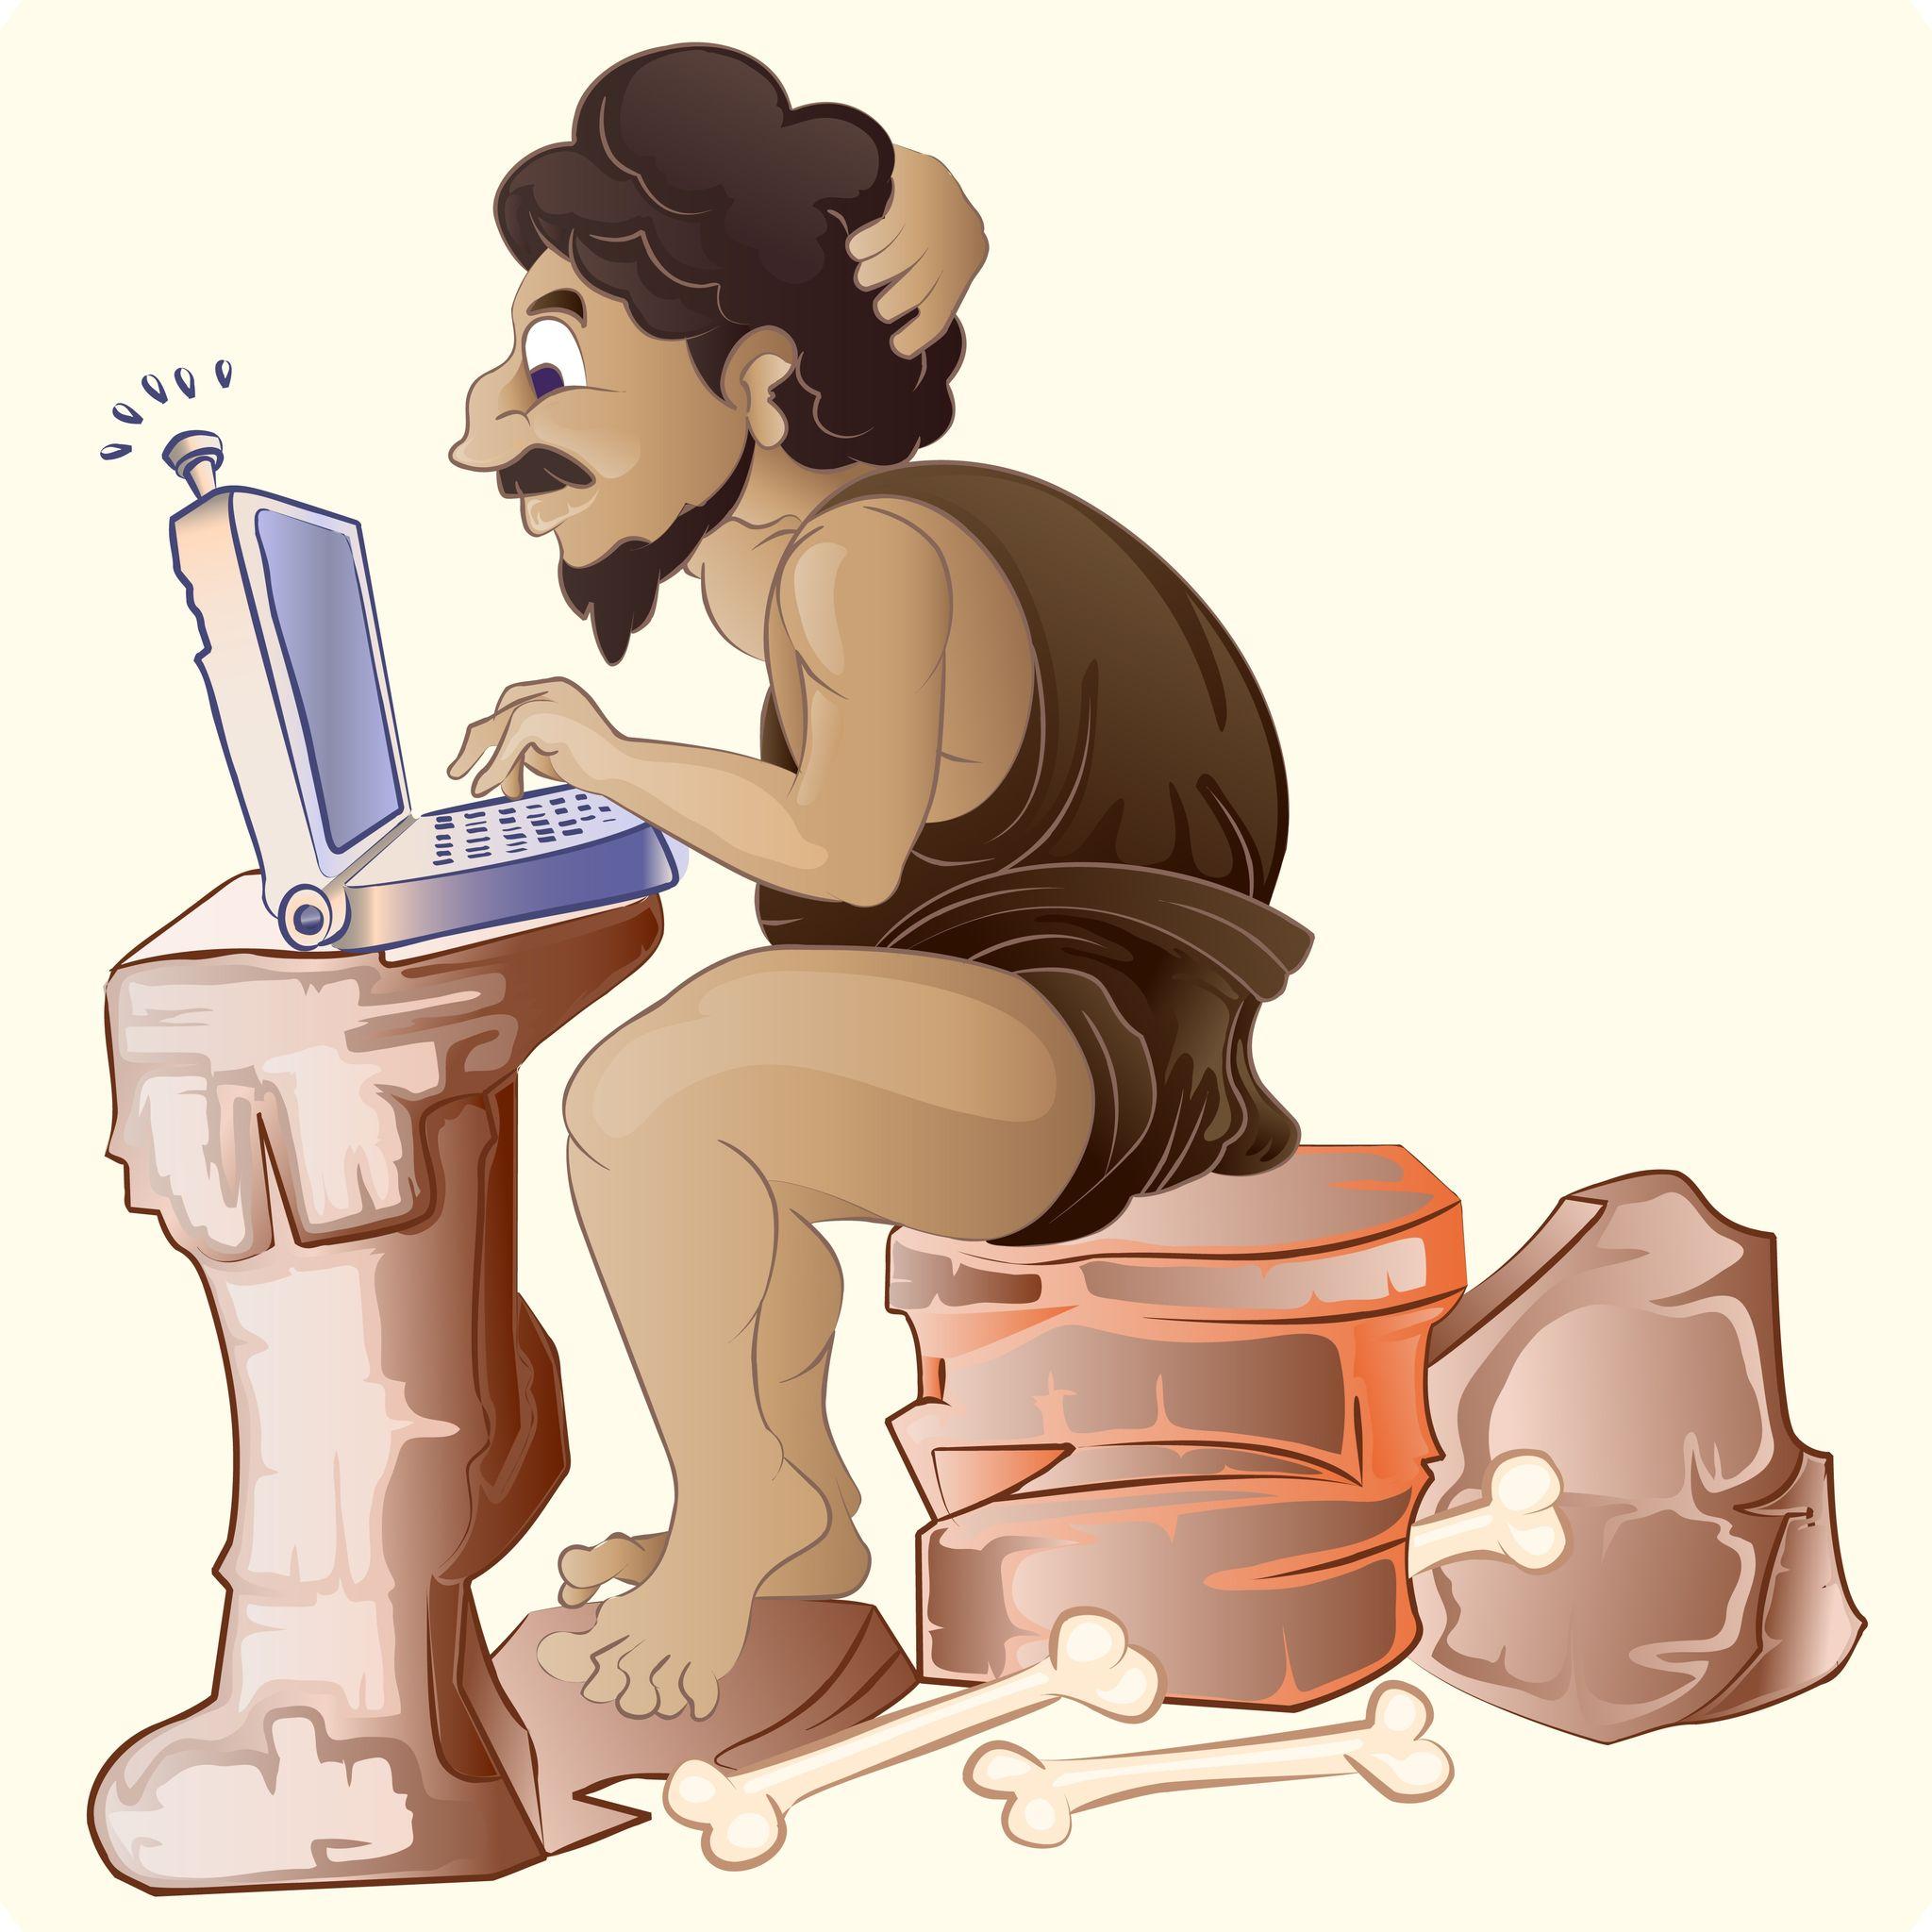 caveman-with-laptop